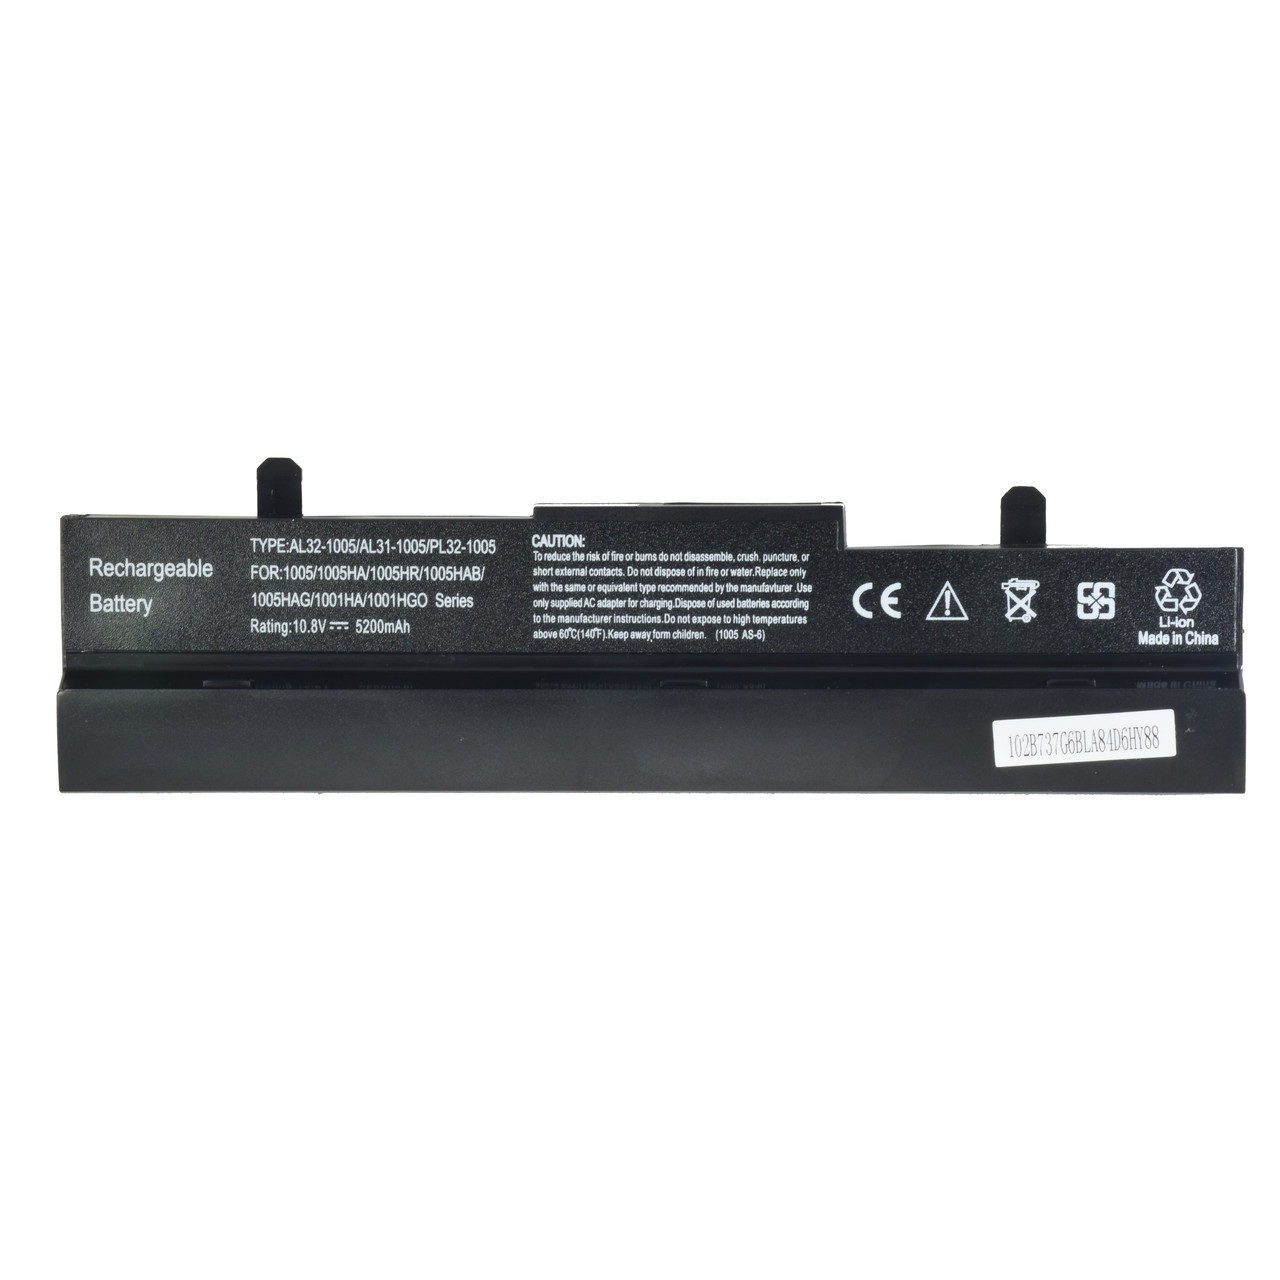 Батарея для ноутбука ASUS Eee PC  1005HAB 1005HAG 1005HE 1005HR 1005P 1005PE 1005PEG 1005PR 1005PX